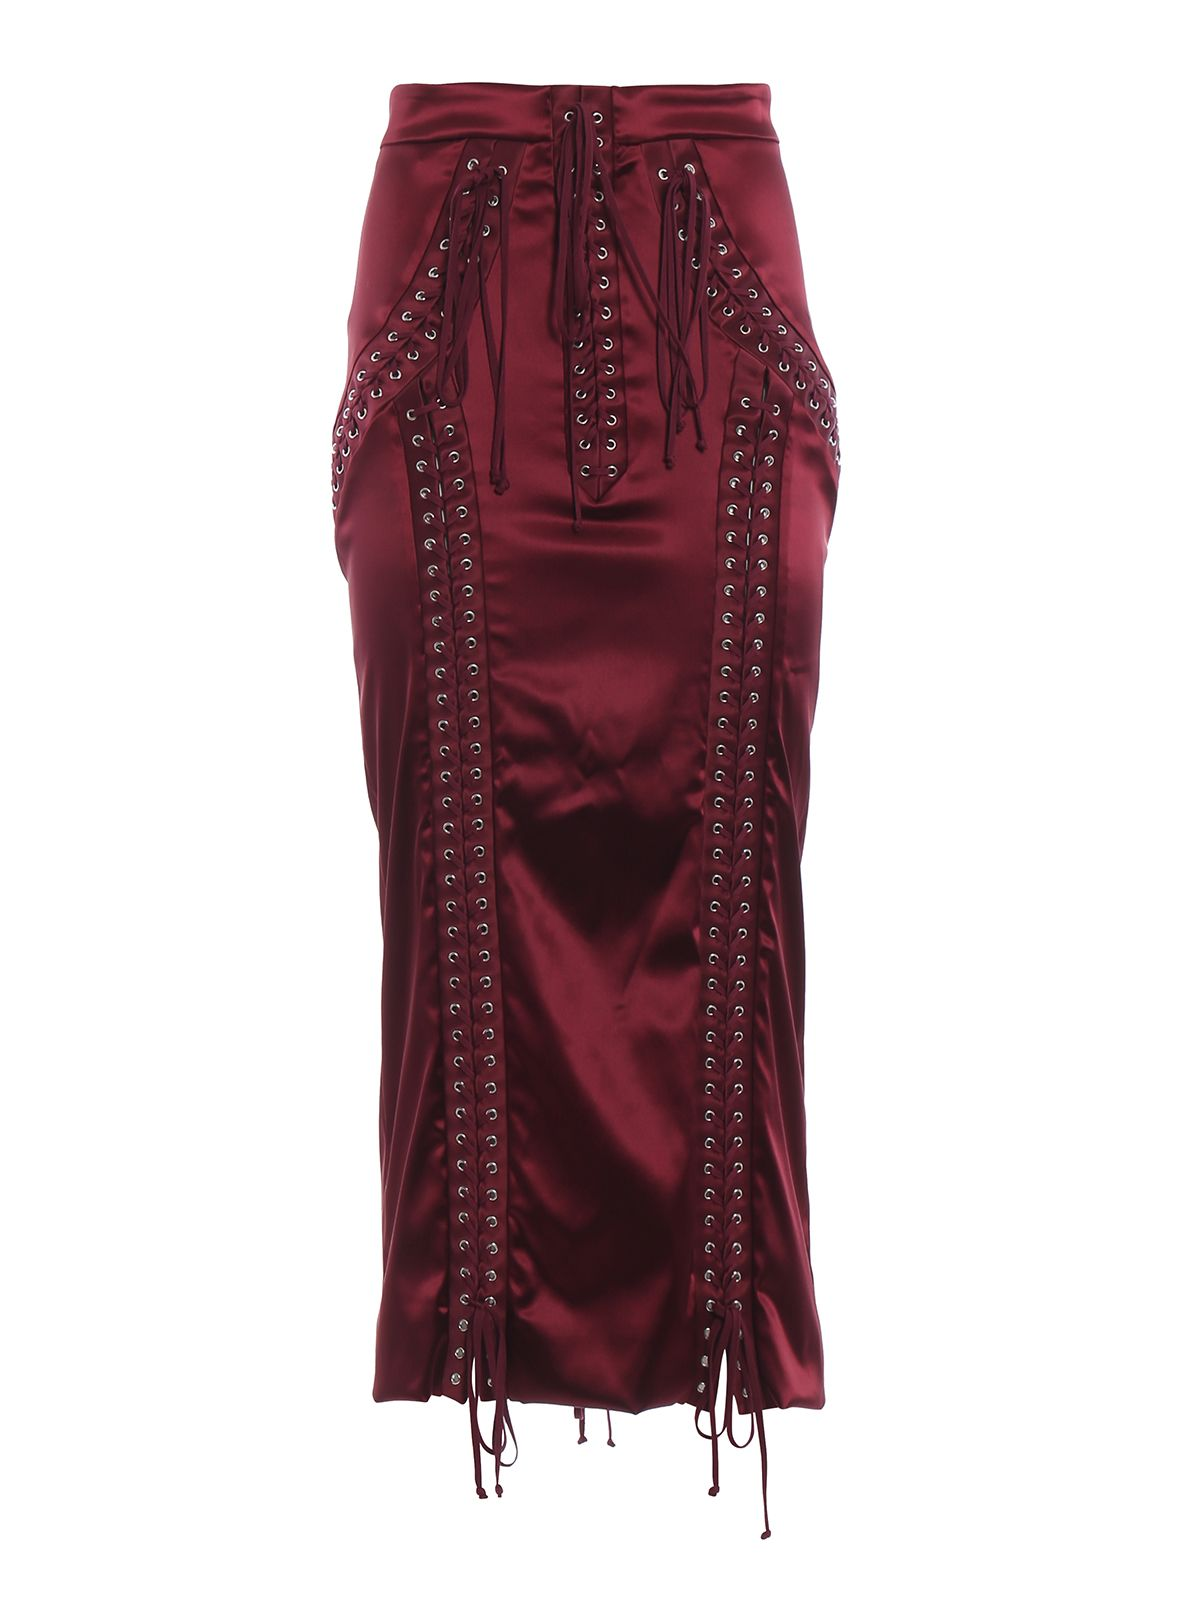 Dolce & Gabbana Corset Stretch Skirt